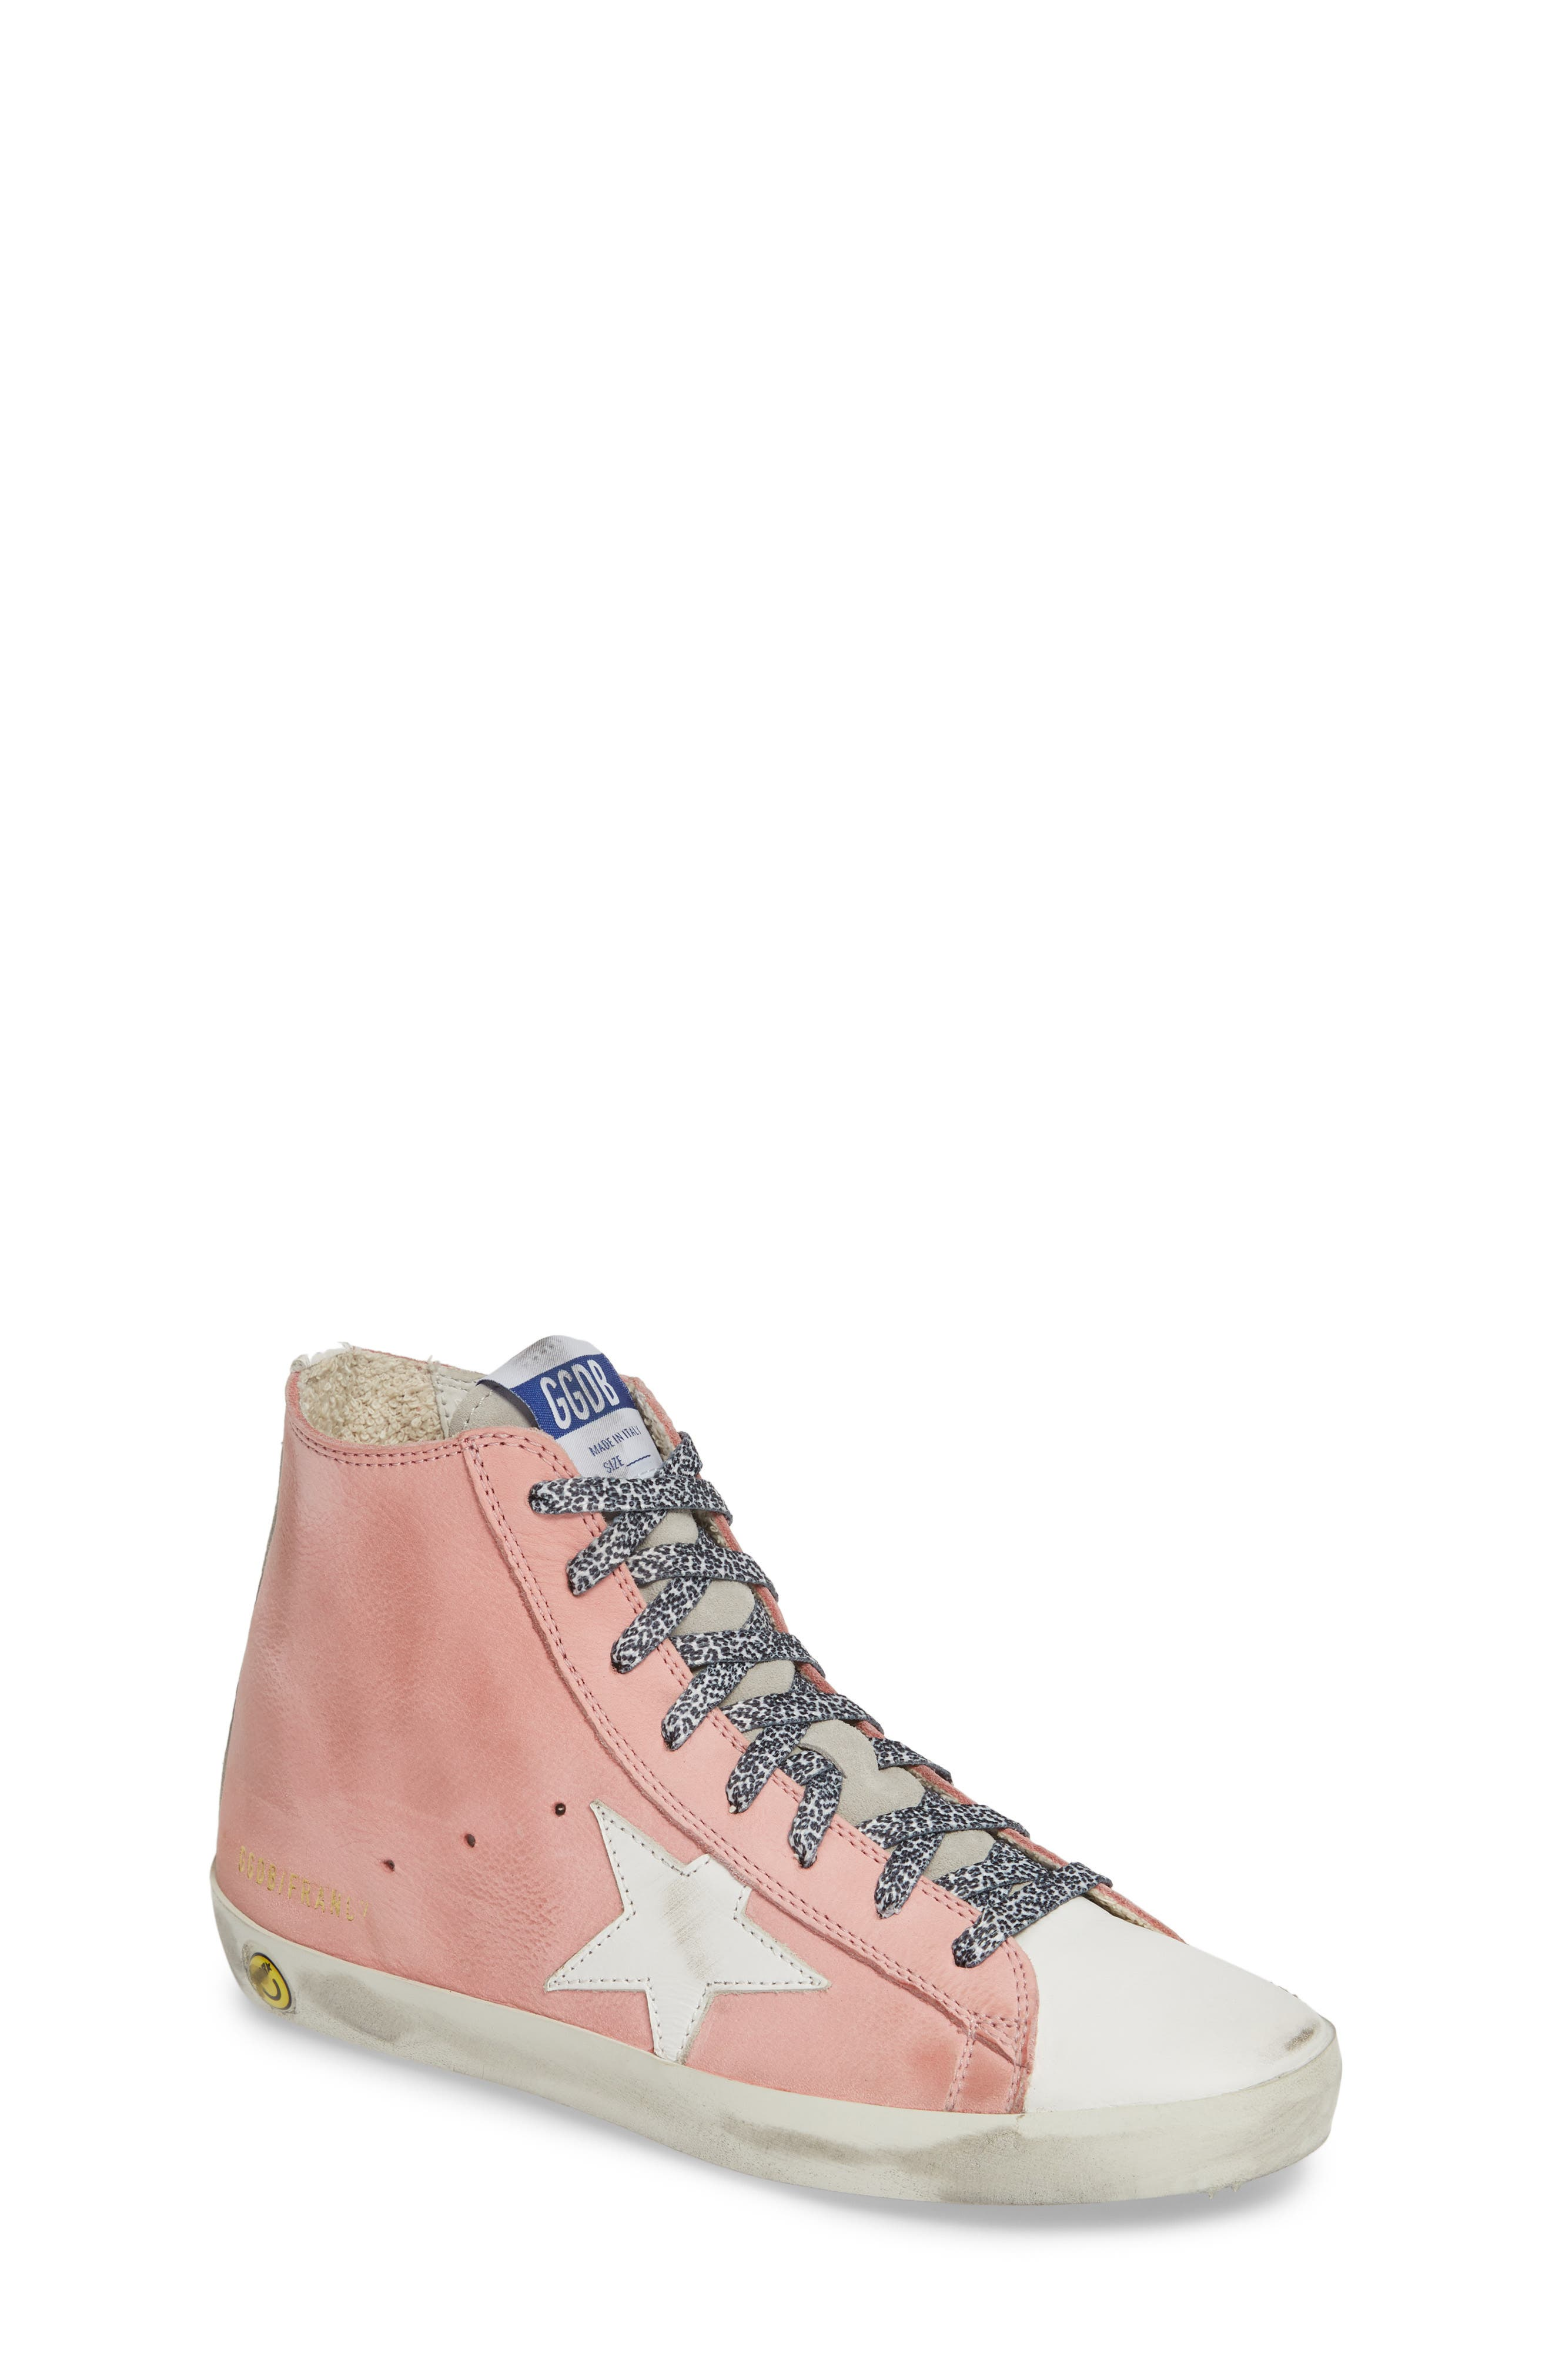 GOLDEN GOOSE, Francy High Top Sneaker, Main thumbnail 1, color, PINK PEONY